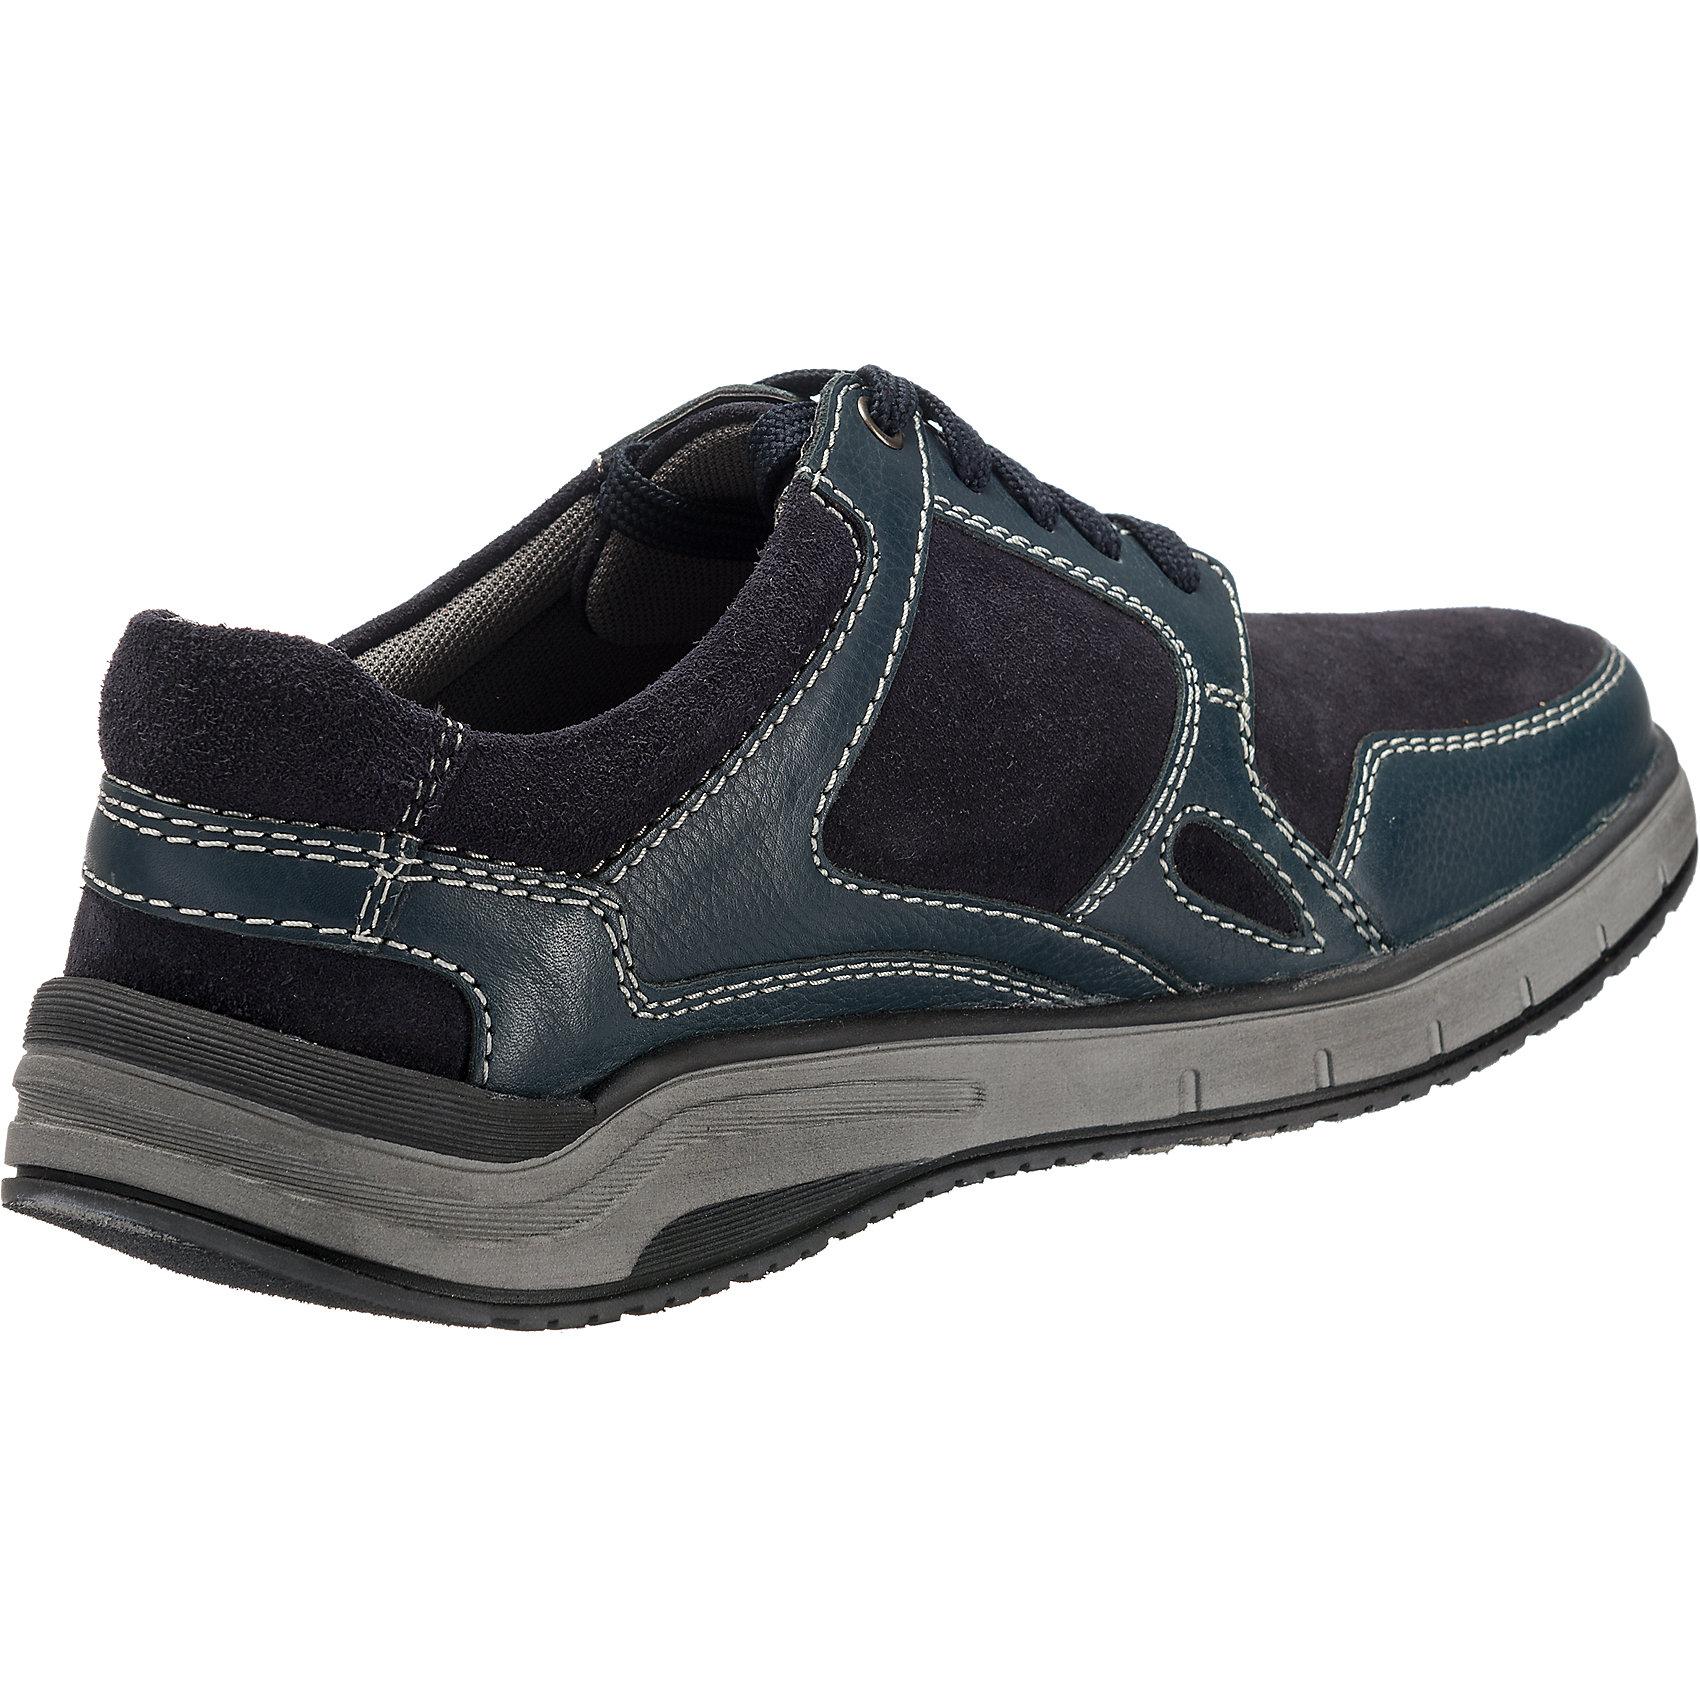 Neu ROHDE dunkelblau Fabriano Freizeit Schuhe braun dunkelblau ROHDE 5761459 a7ac57